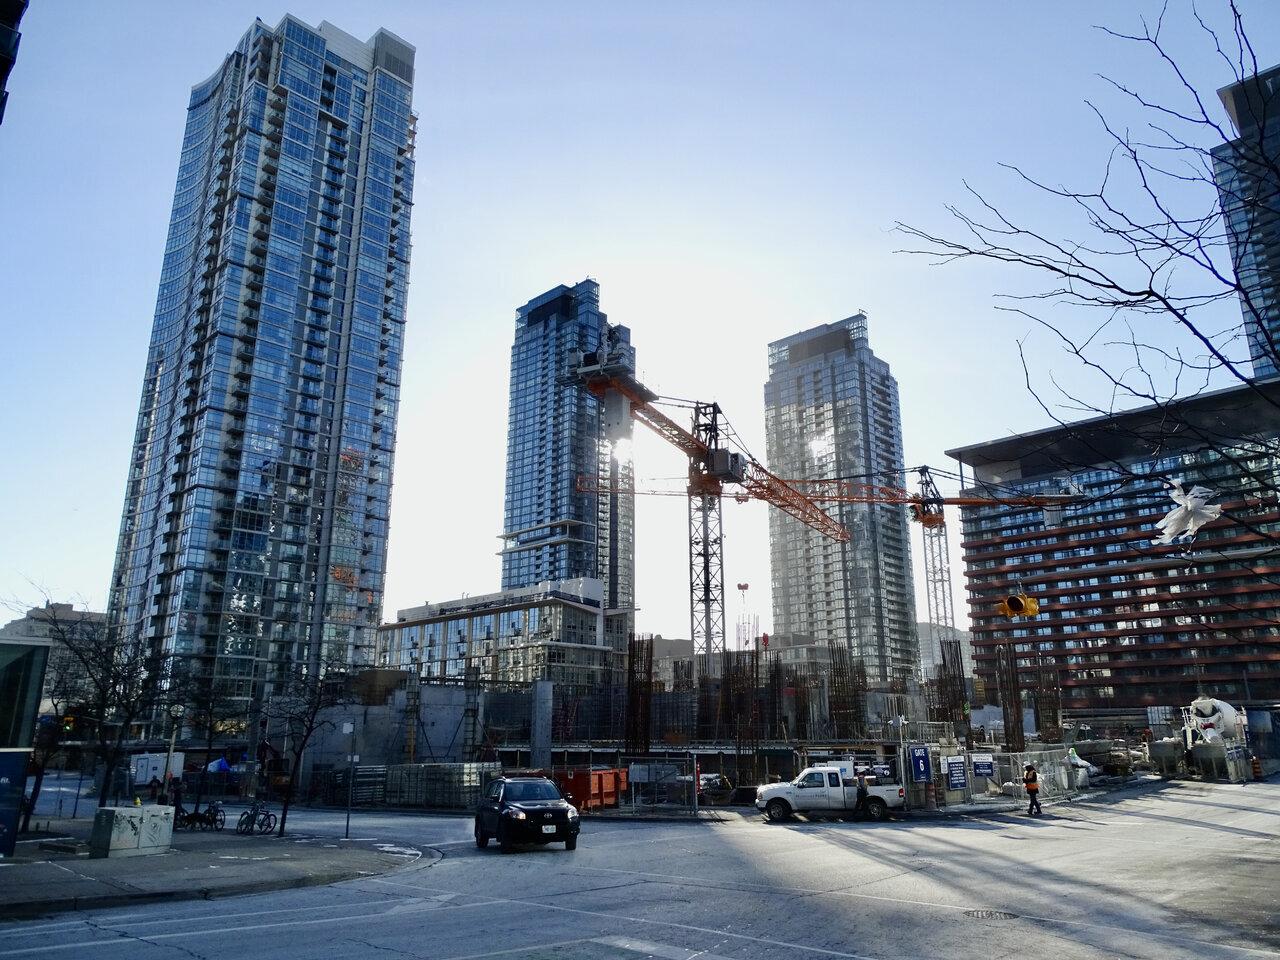 Concord Canada House, CityPlace, IBI Group, Toronto